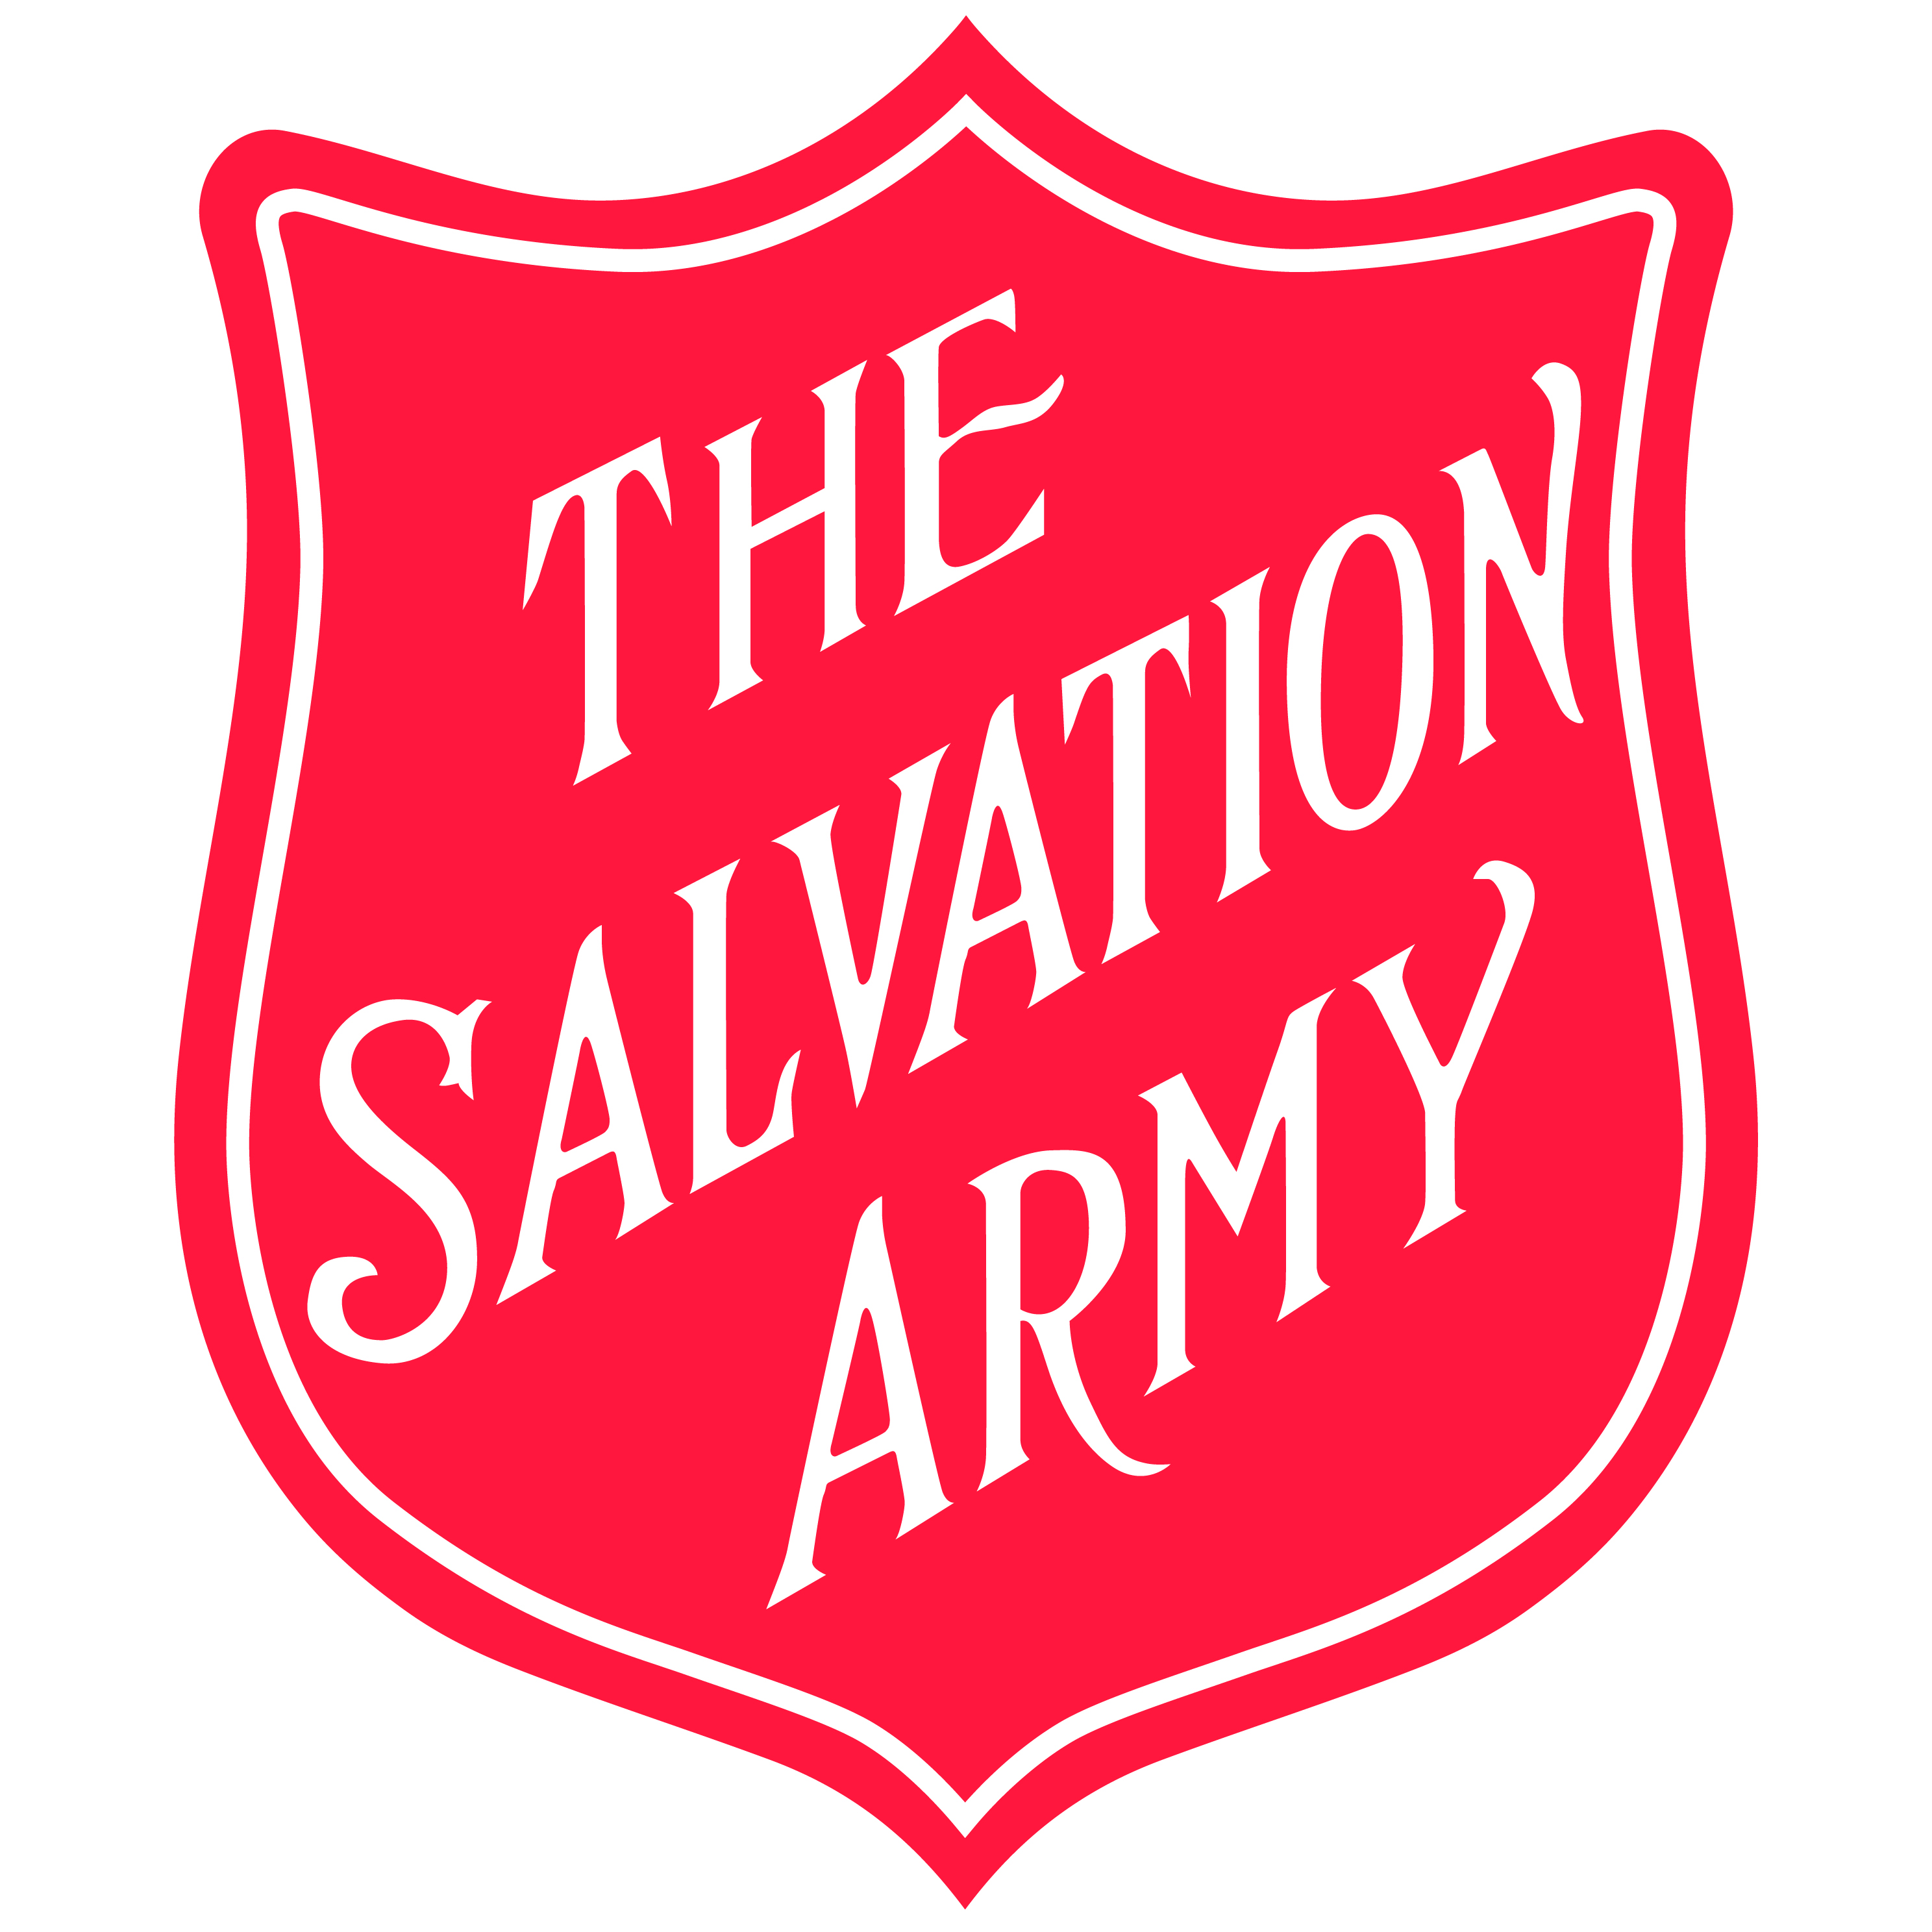 Kirkwall Salvation Army